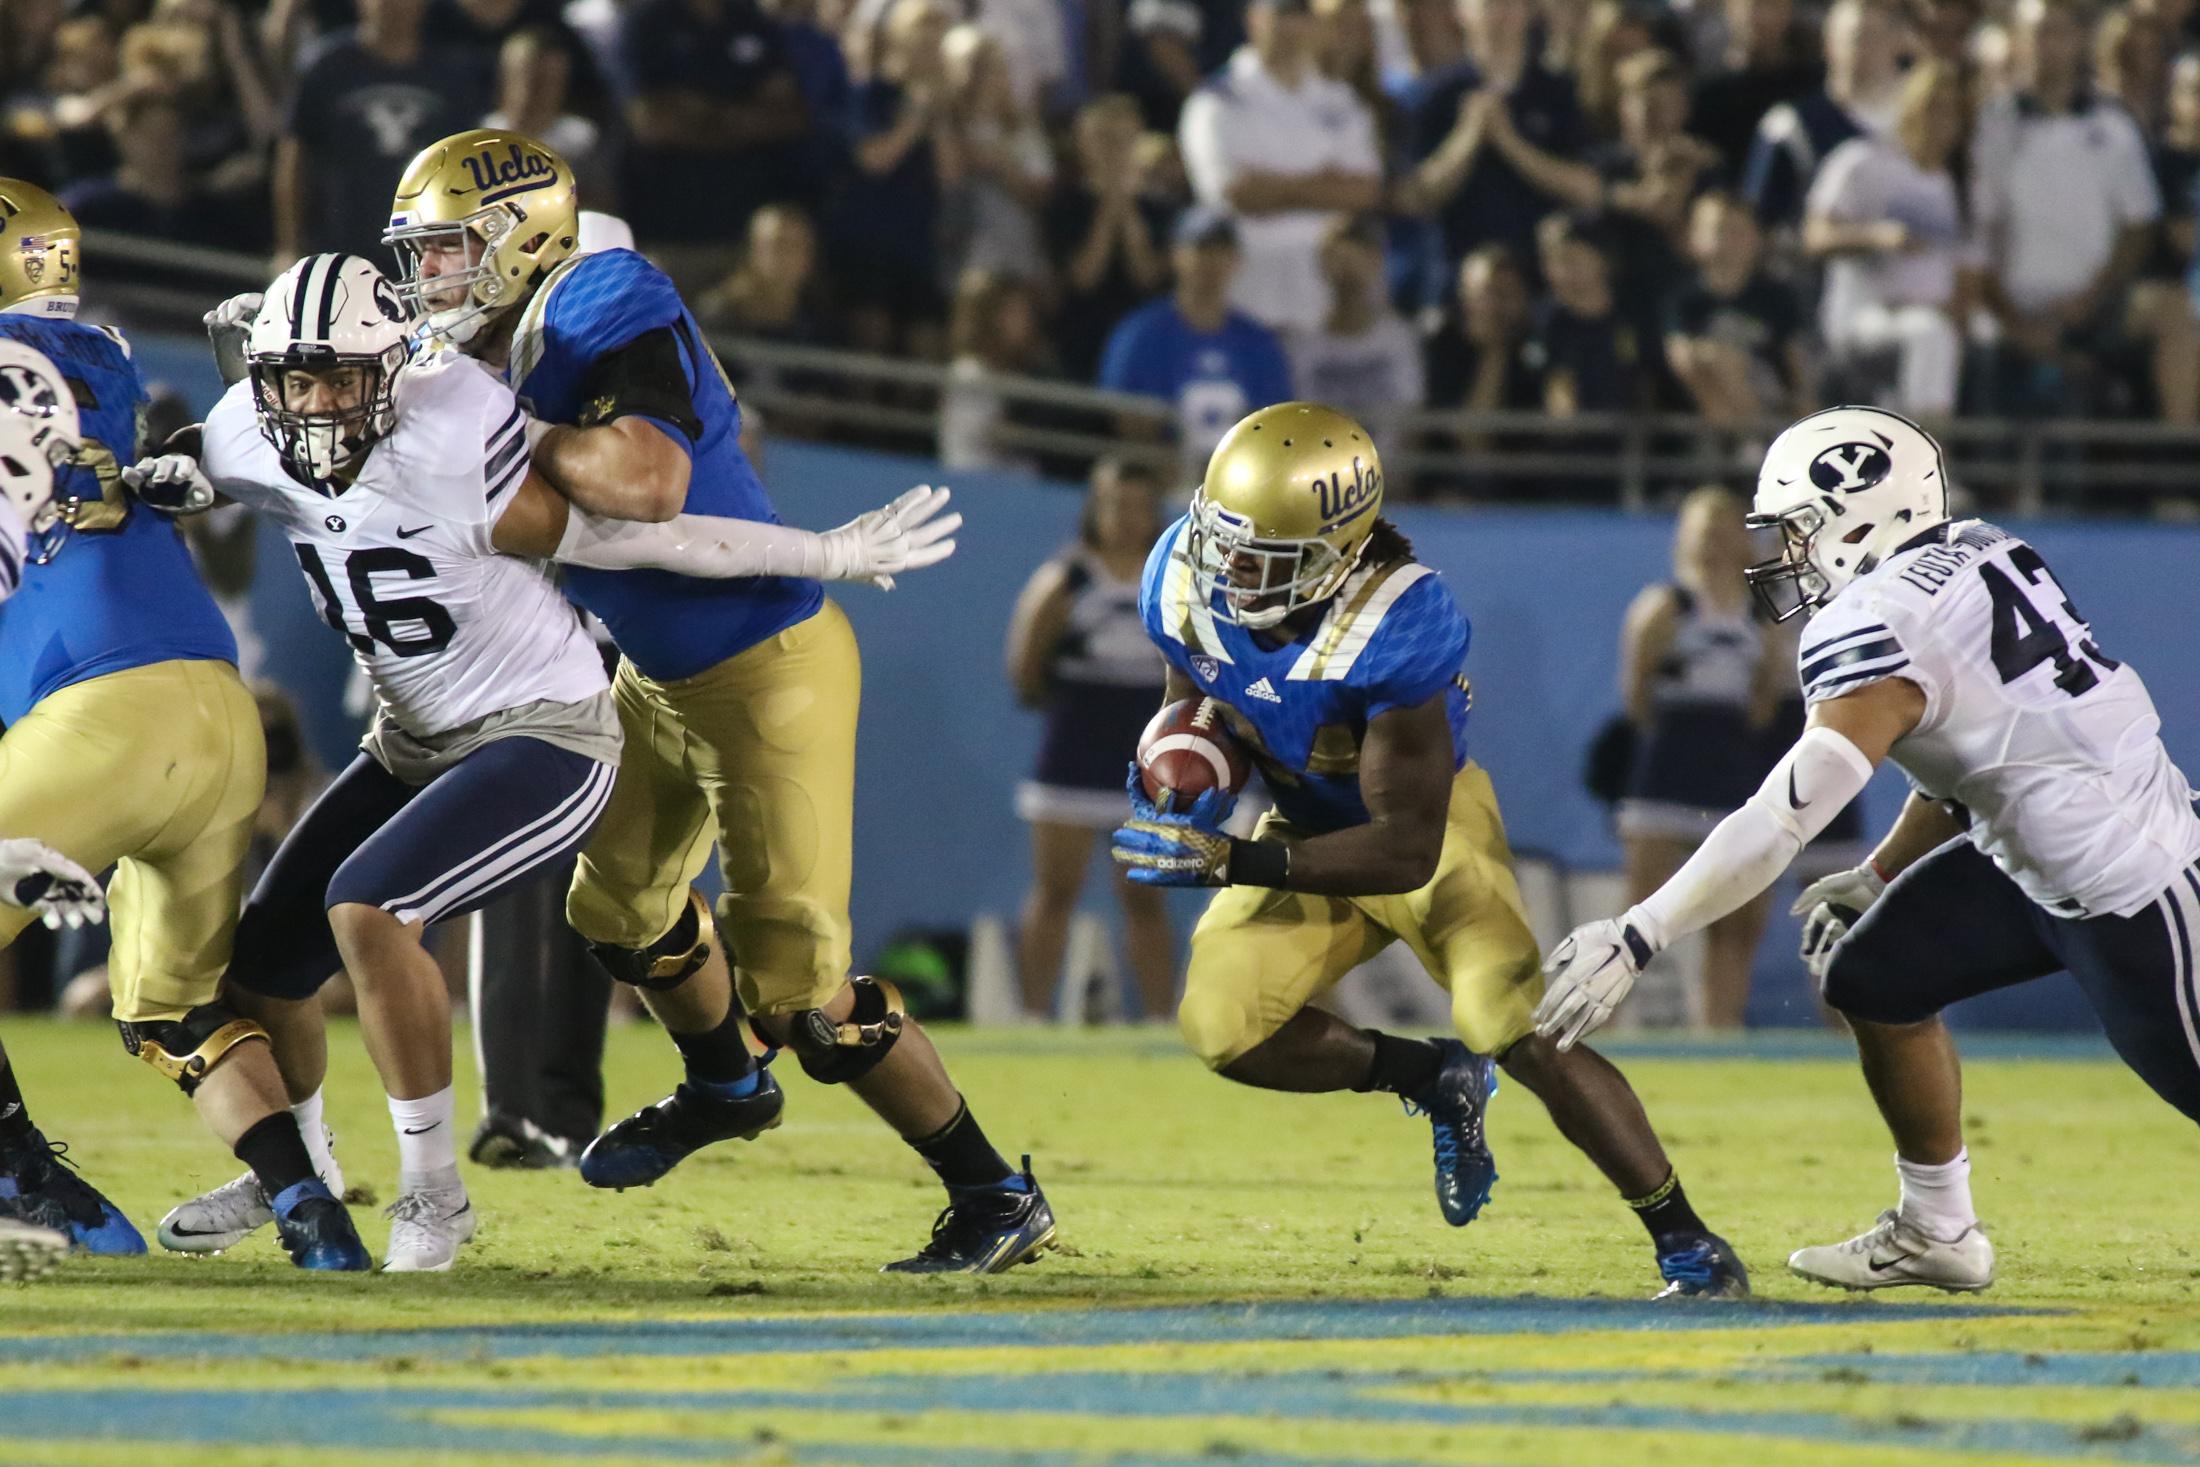 UCLA Bruin Paul Perkins finding a running lane. Photo by Jevone Moore